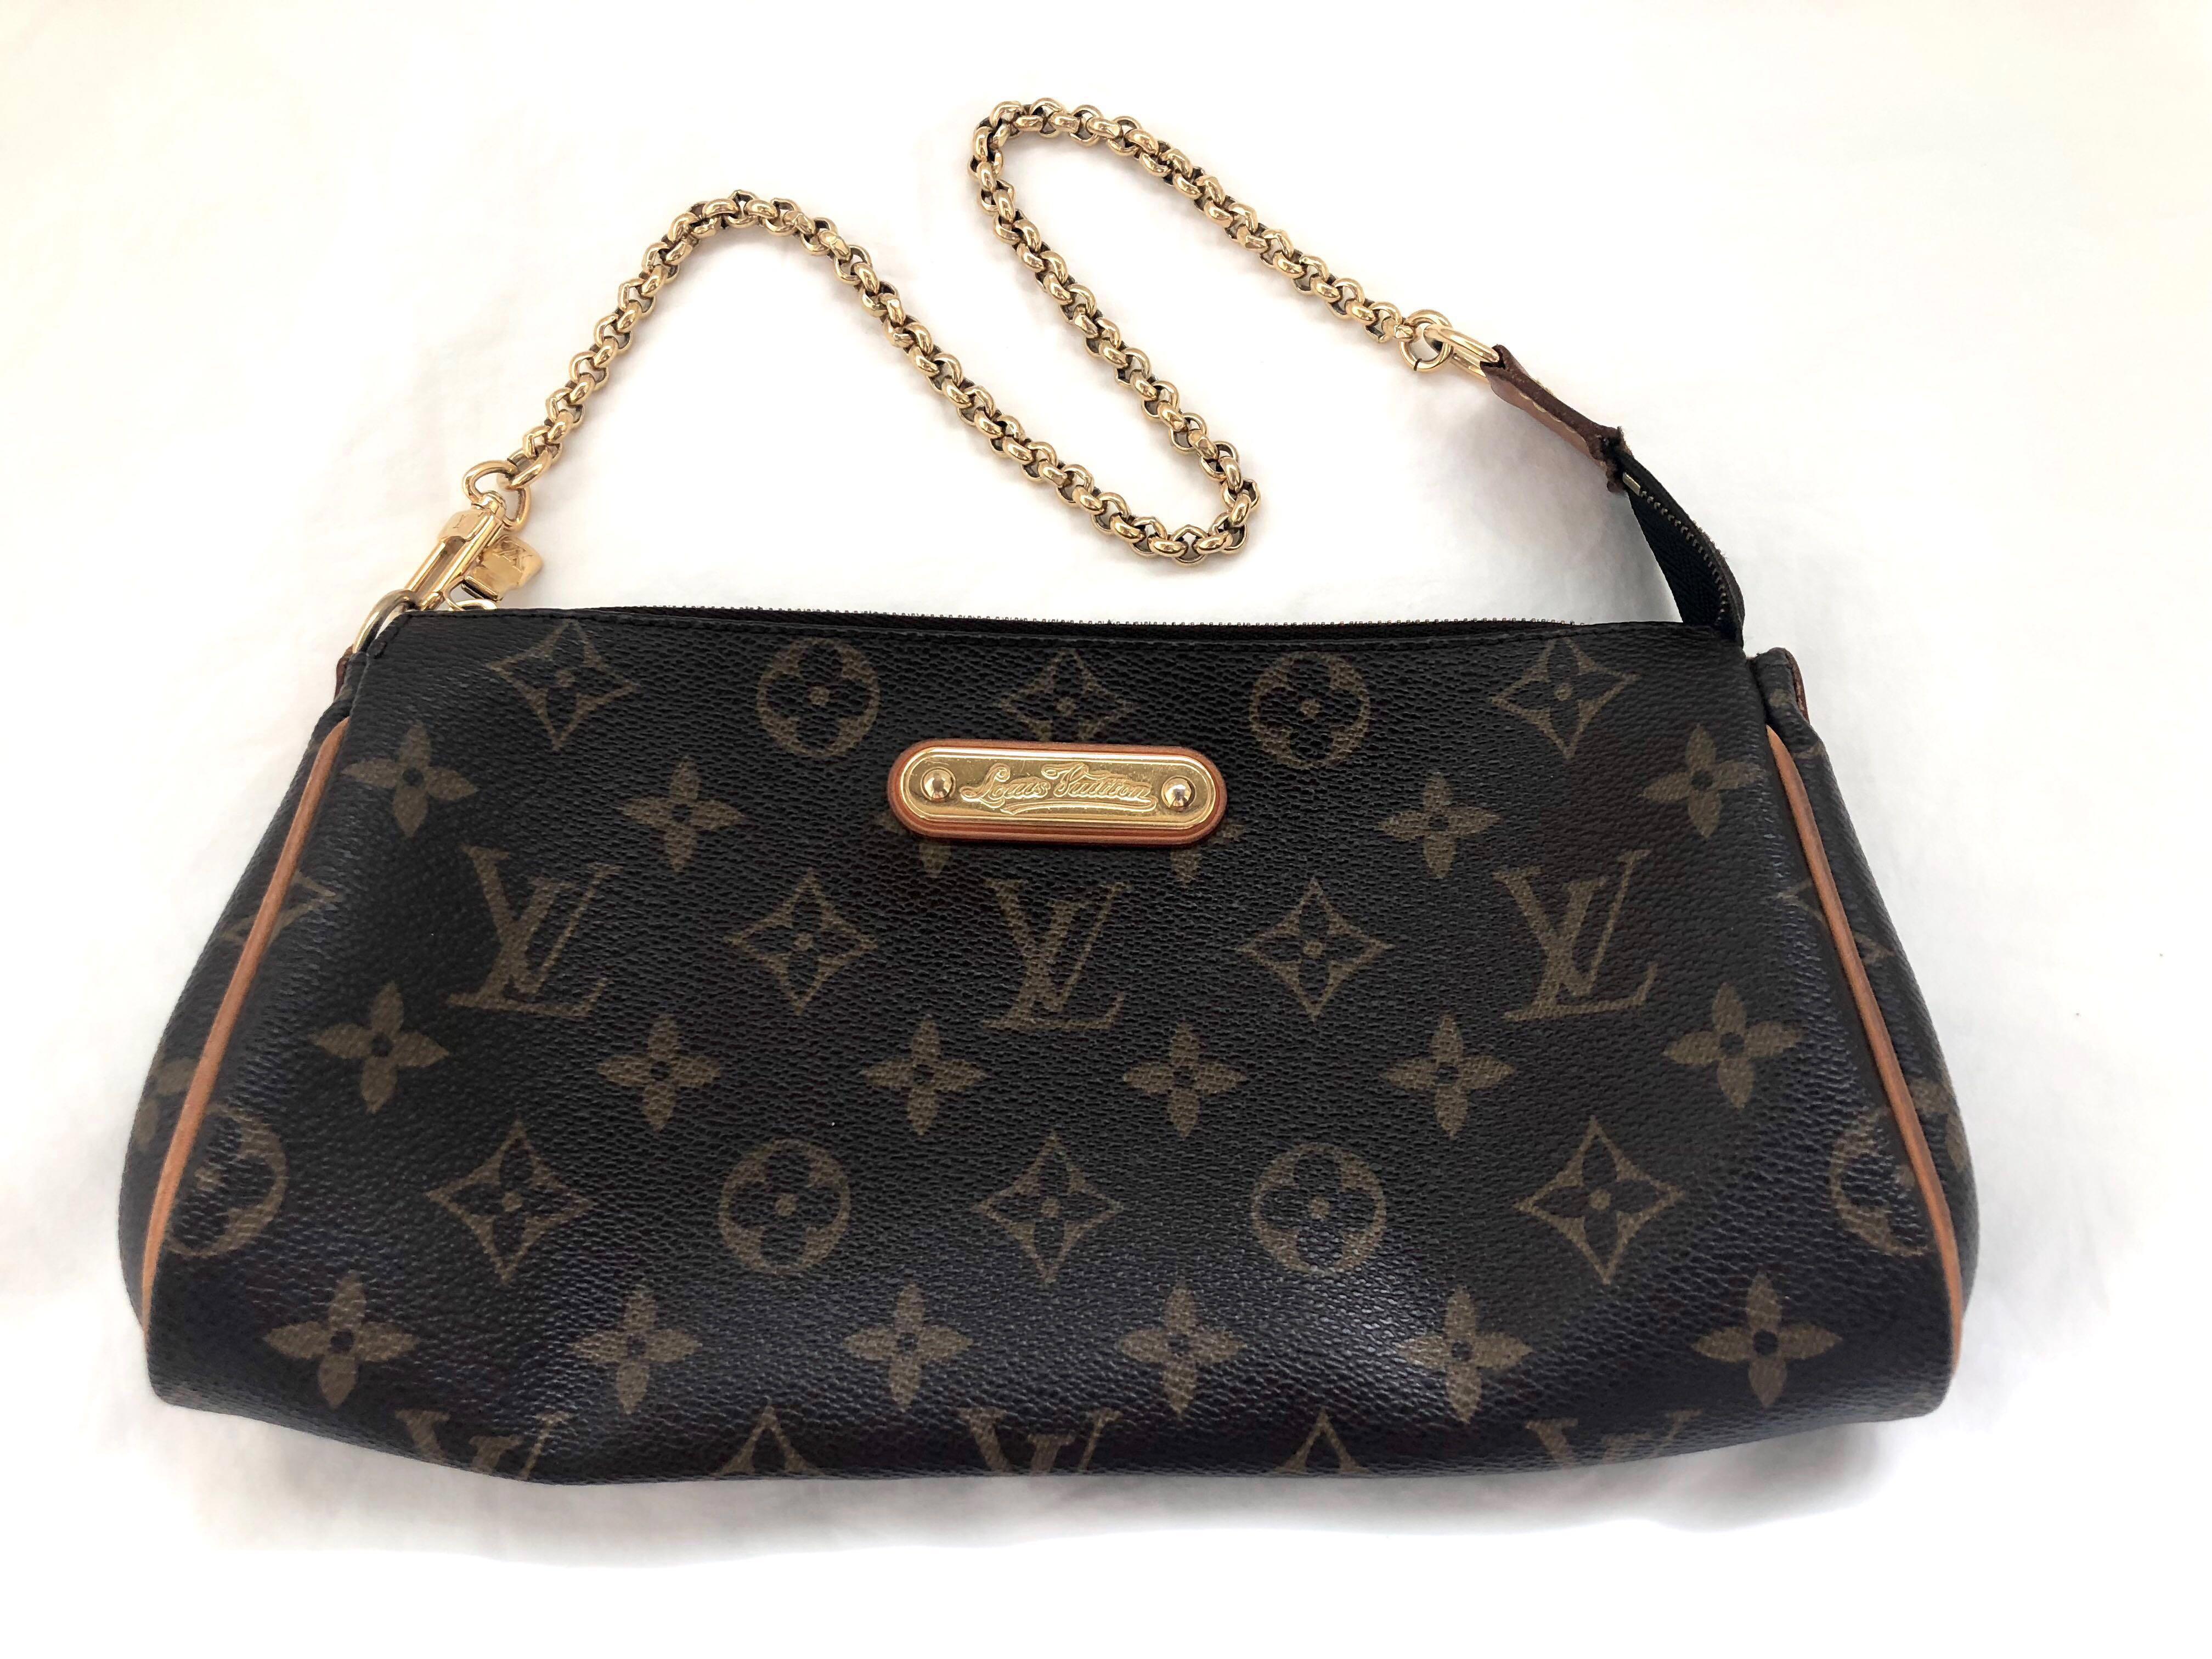 5a8373b22860 Preloved Authentic Louis Vuitton Eva Clutch